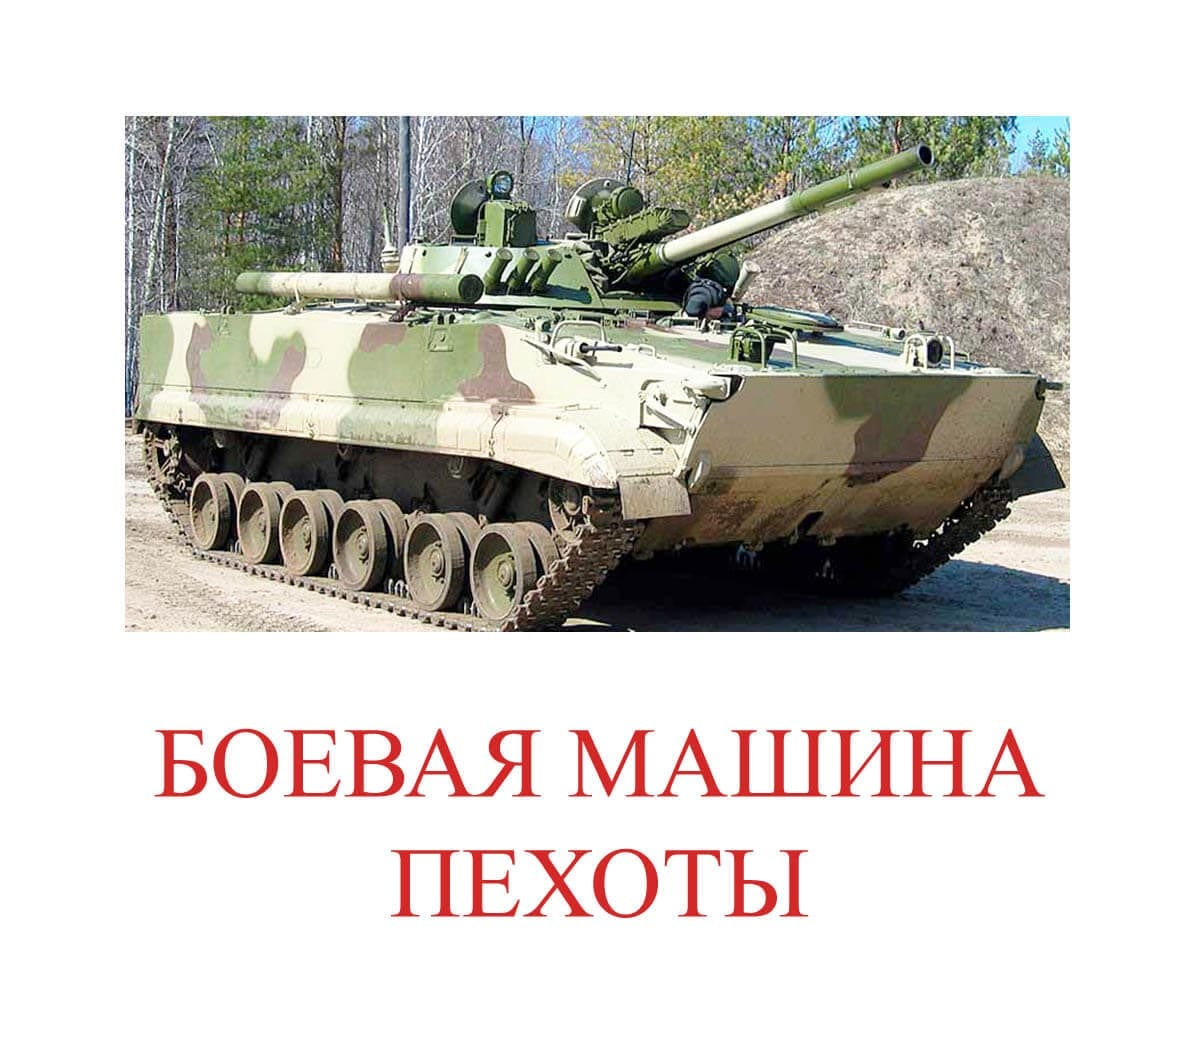 Боевая машина пехоты картинка